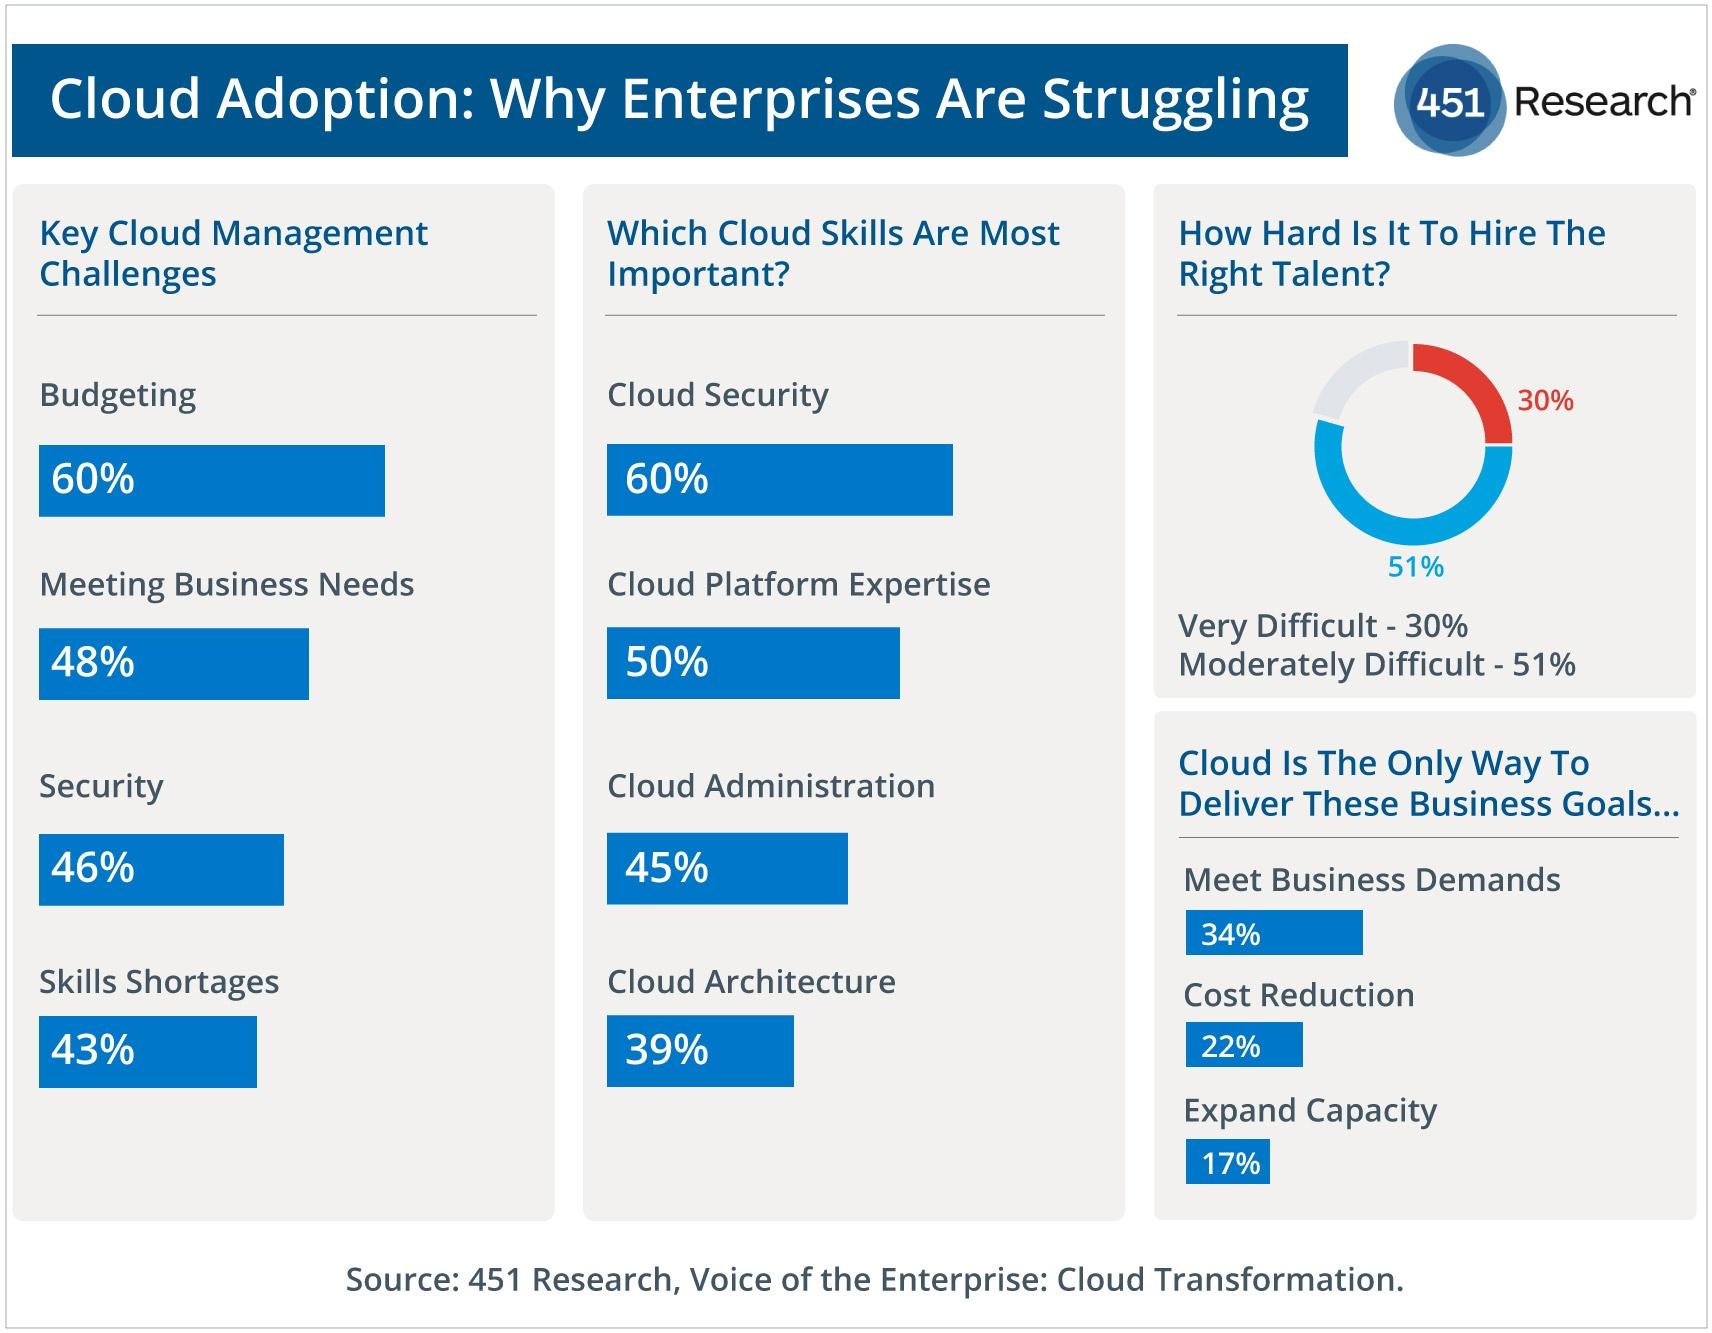 Cloud Adoption: Why Enterprises Are Struggling